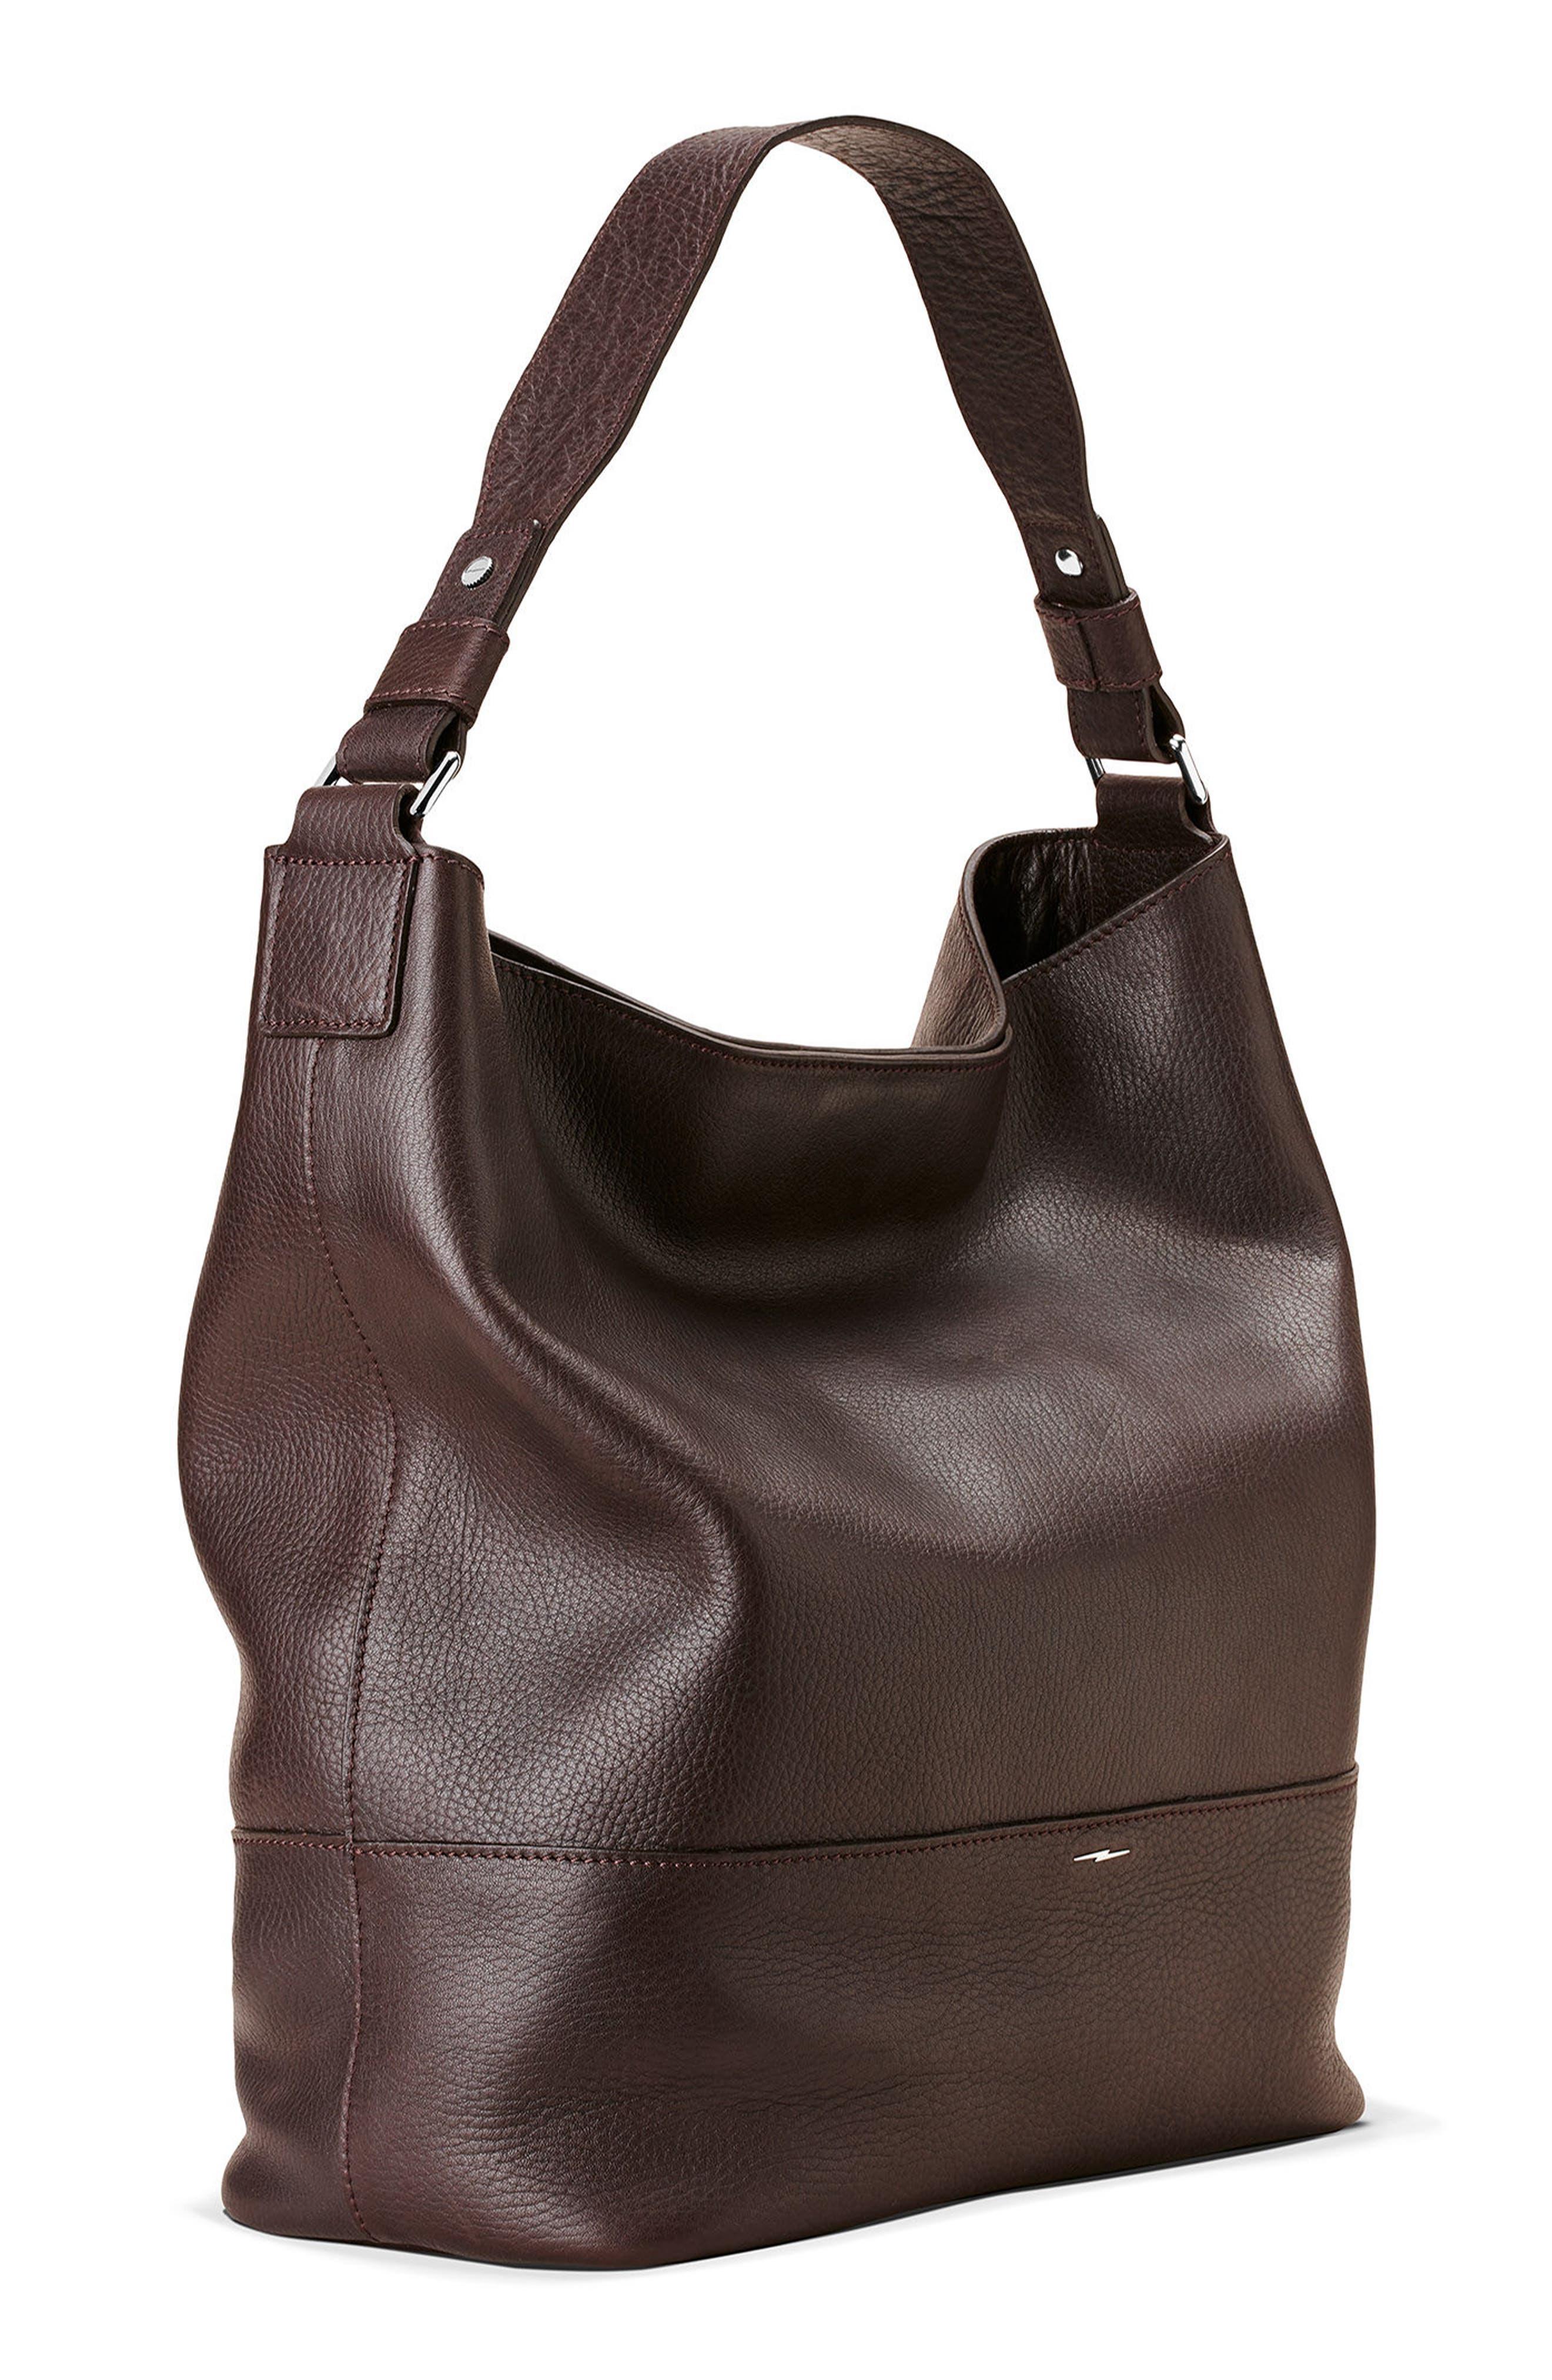 Relaxed Calfskin Leather Hobo Bag,                             Alternate thumbnail 8, color,                             240